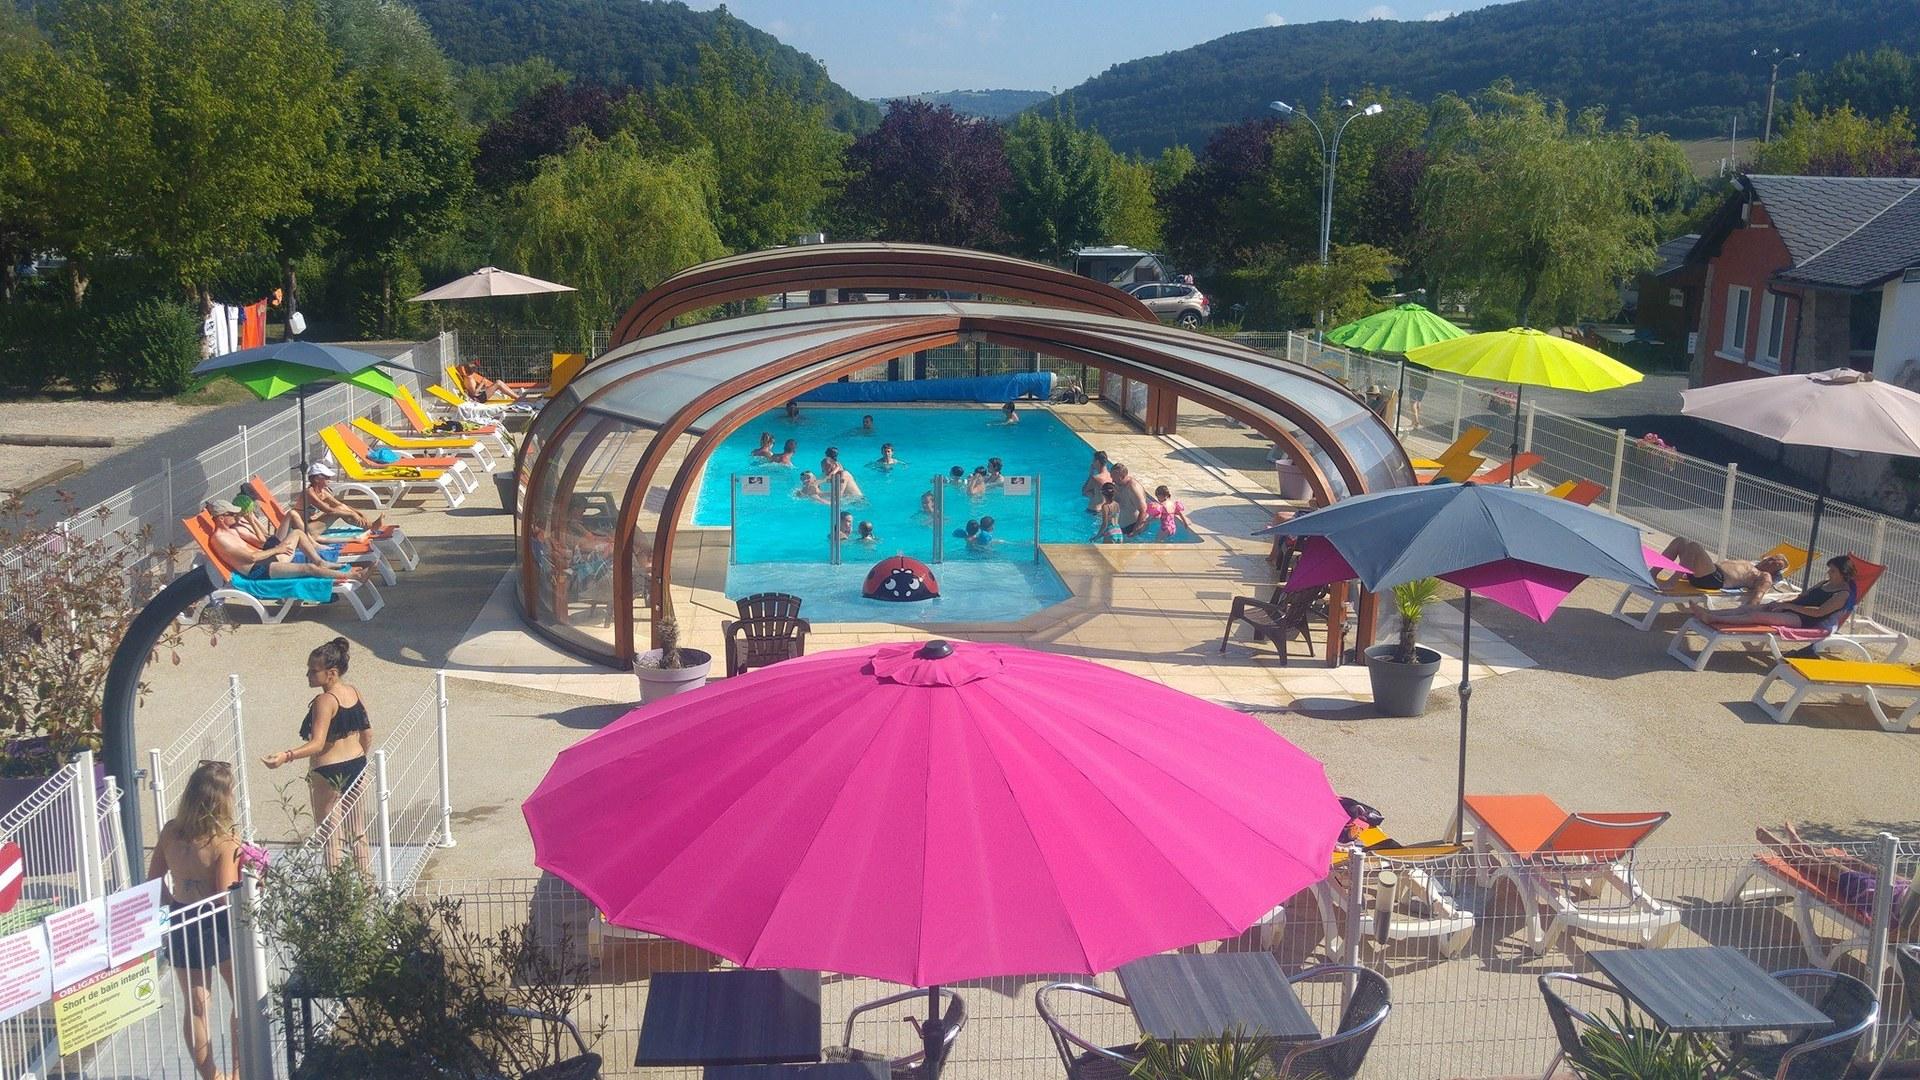 Frankrijk-SeveracleChateau-Camping%20Les%20Calquieres-ExtraLarge Campings Frankrijk